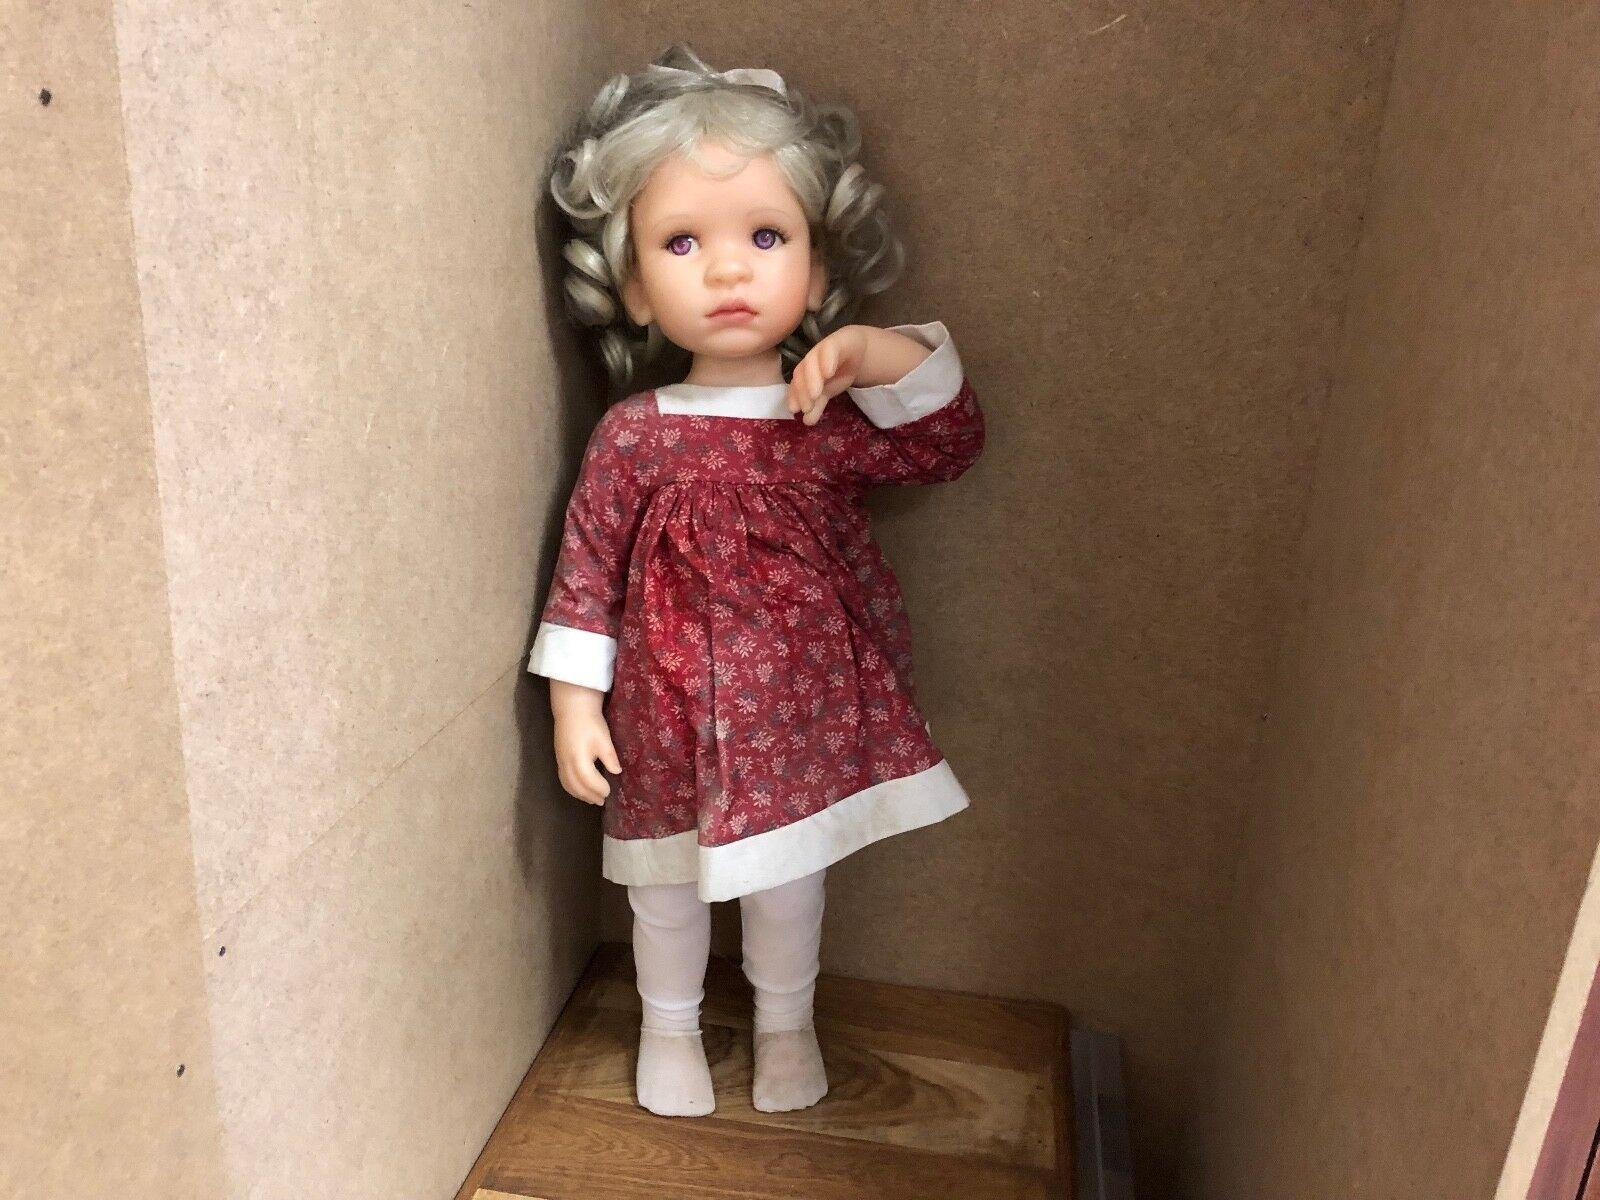 Pamela Erff Resin Puppe 50 cm. Top Zustand